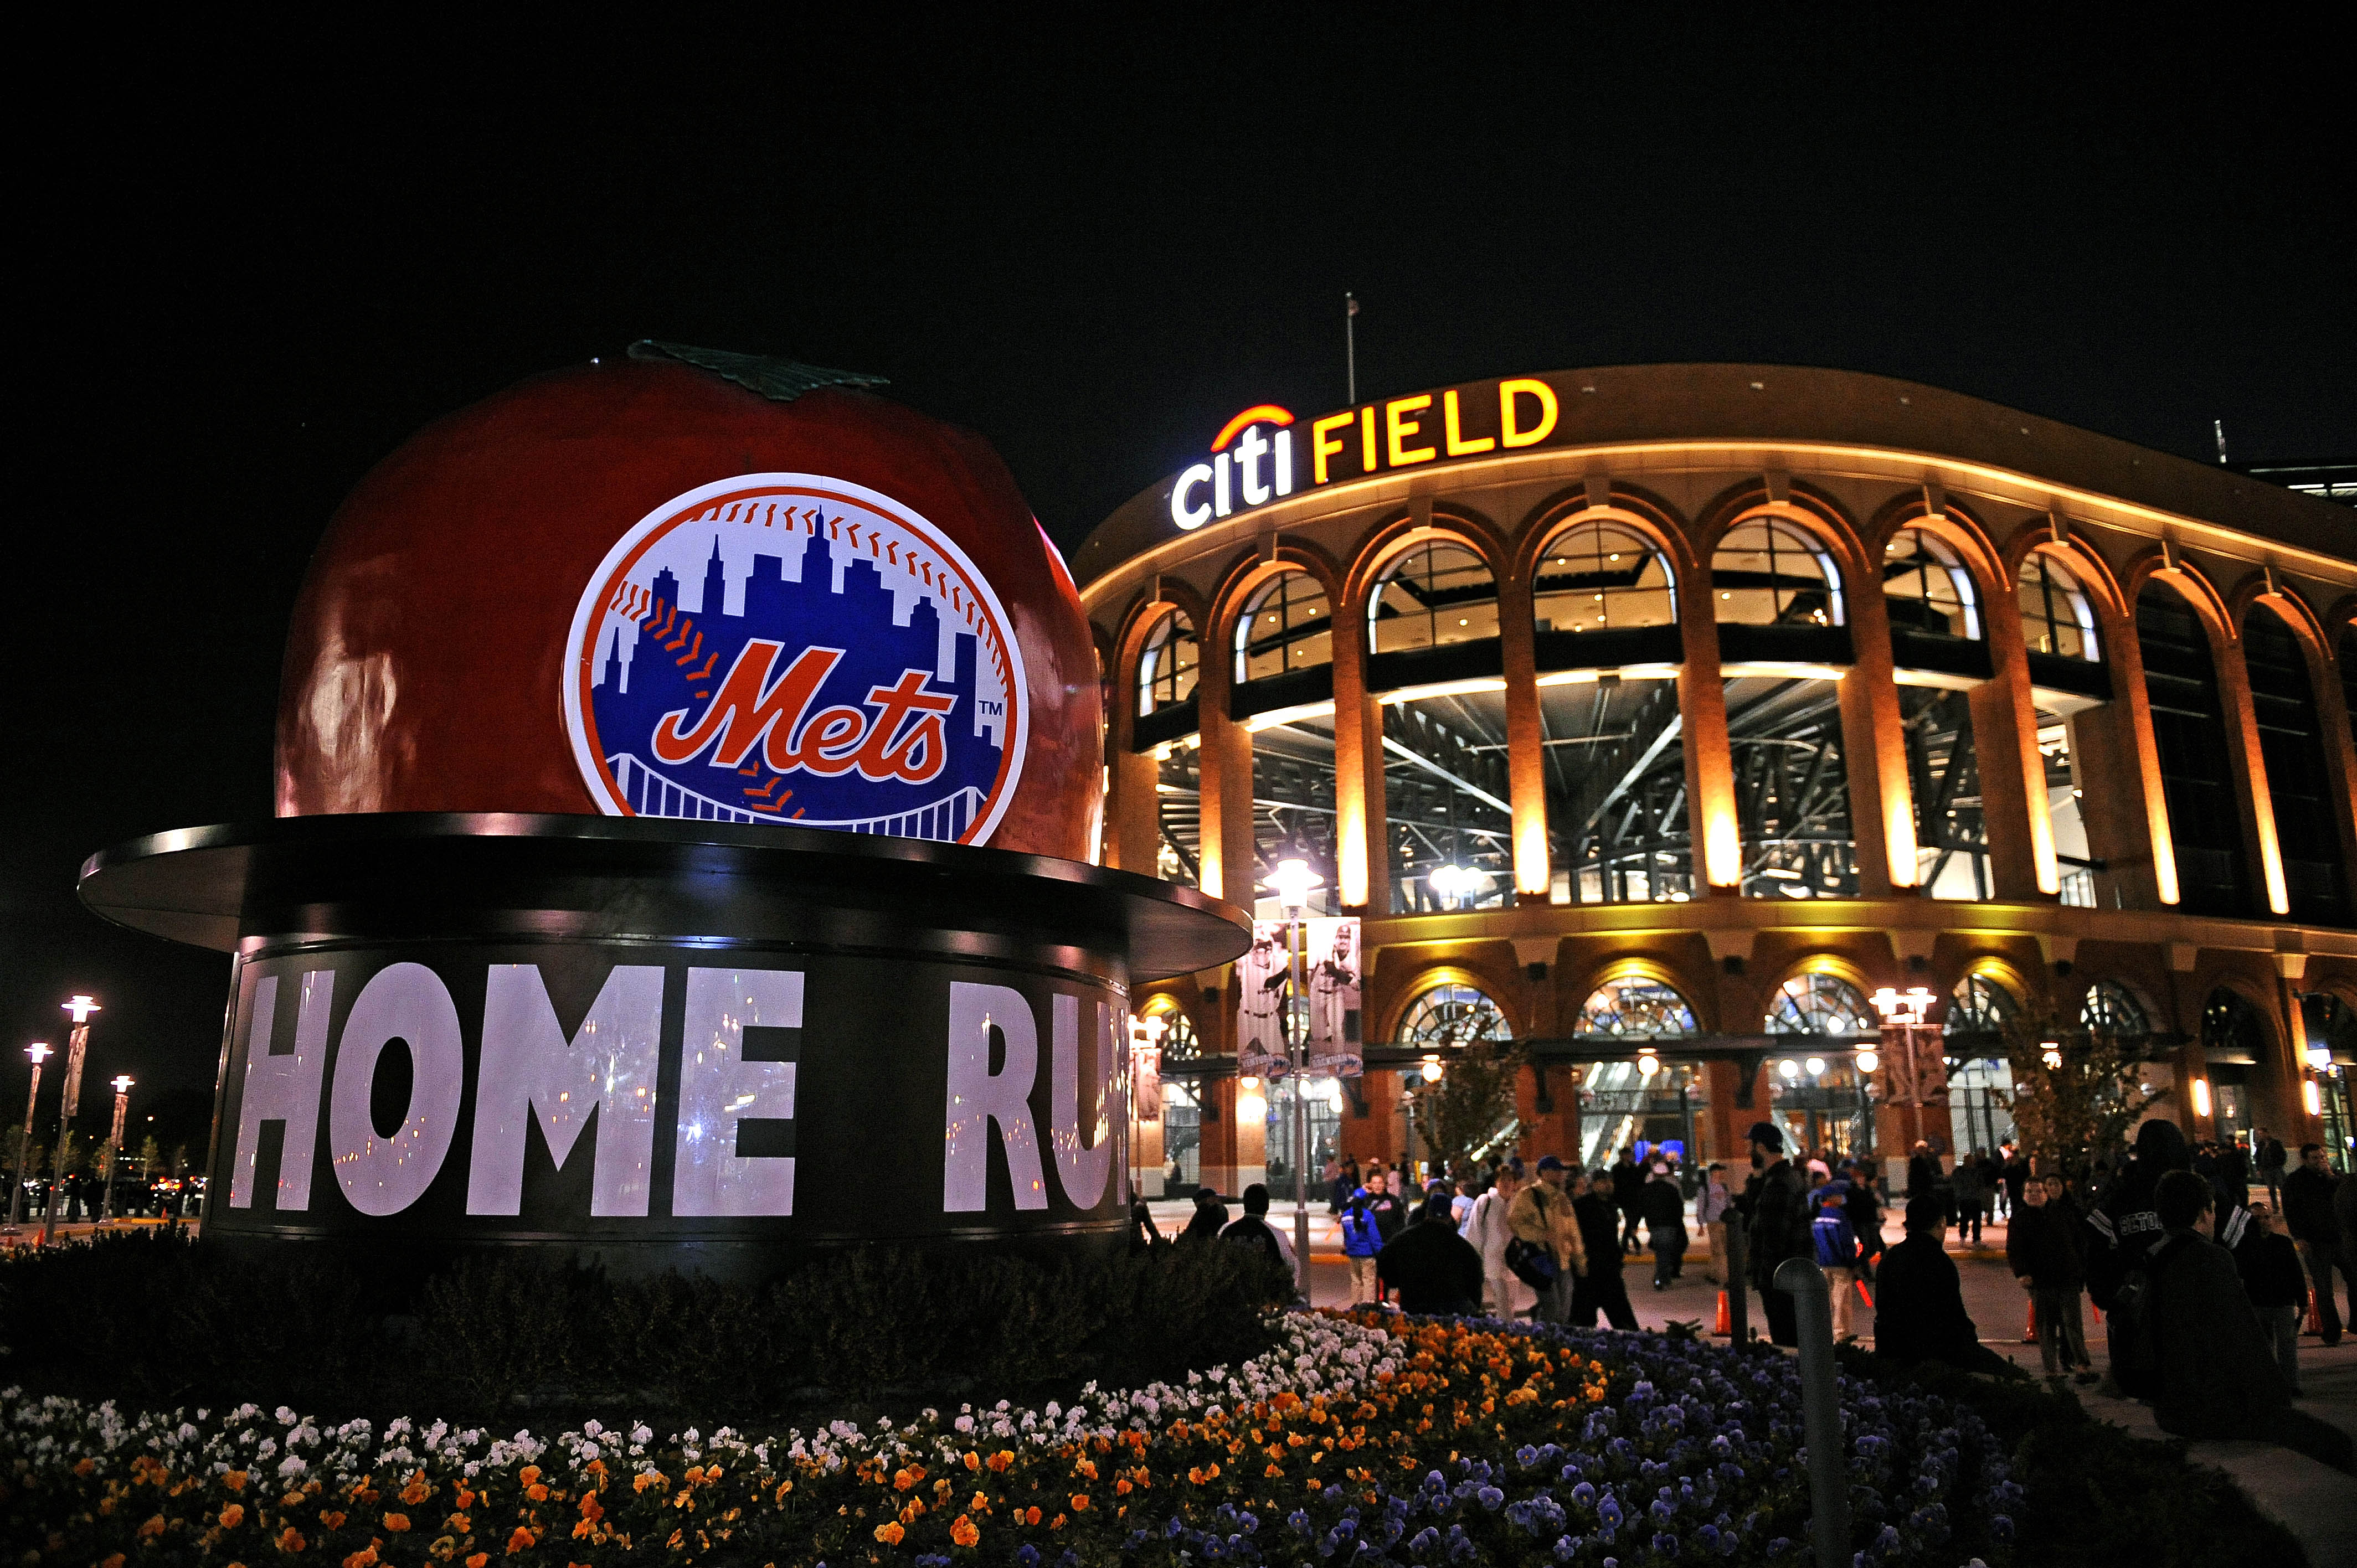 NEW YORK METS baseball mlb 42 wallpaper 4256x2832 232352 4256x2832